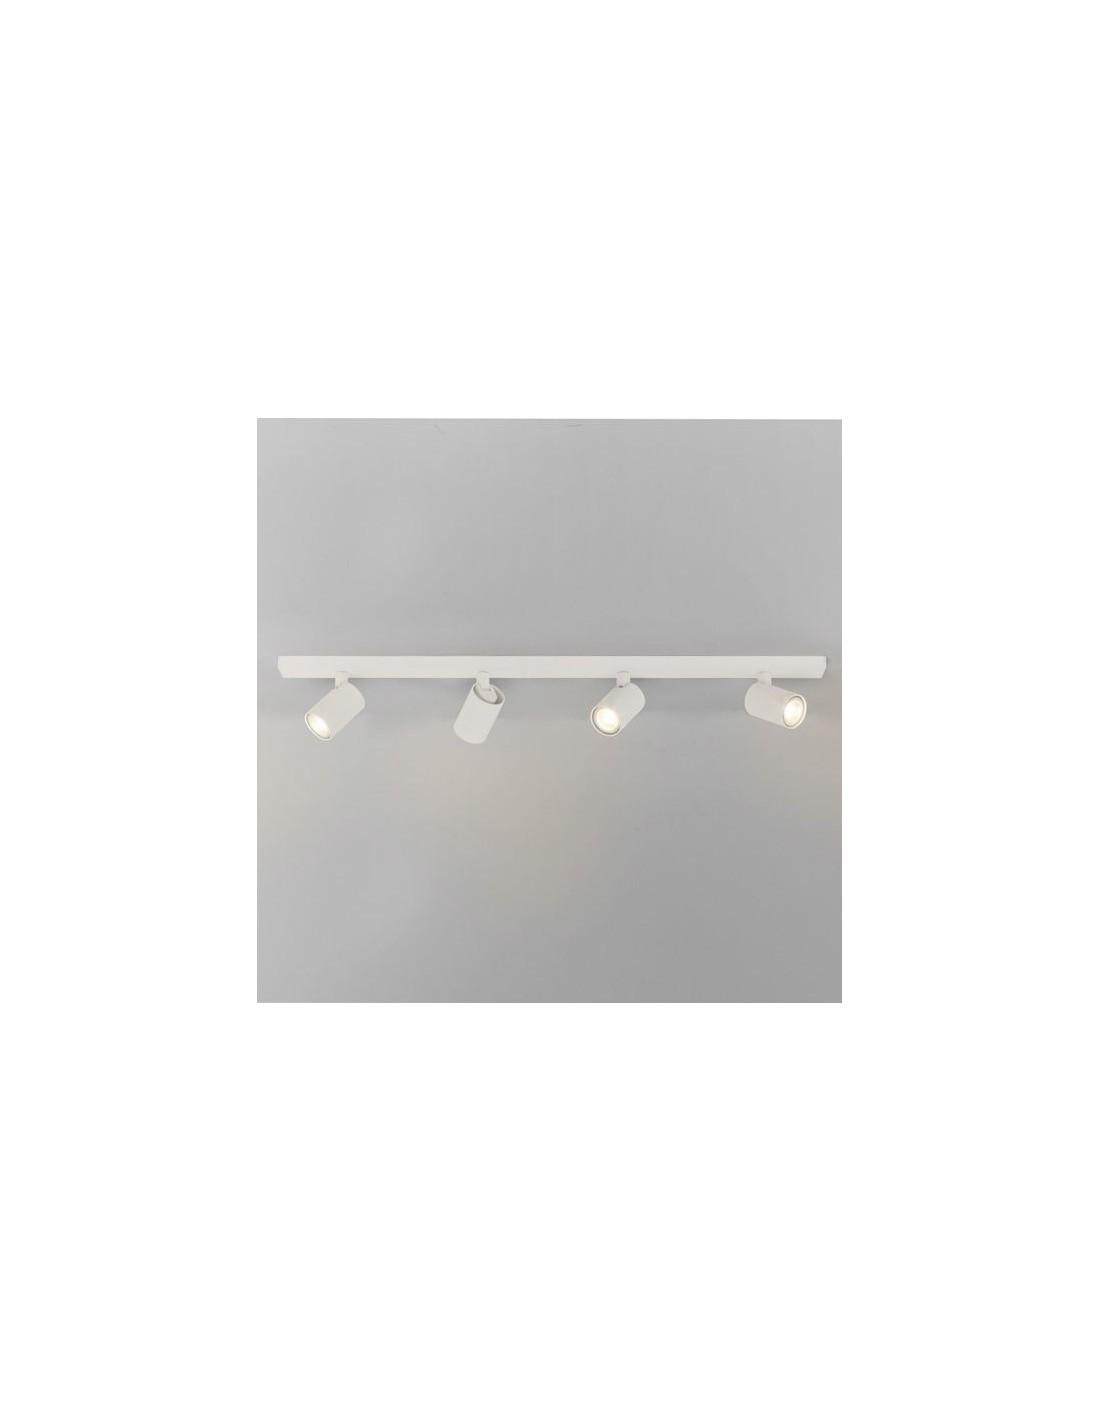 ascoli 4bar valente design applique plafonnier astro lighting blanc